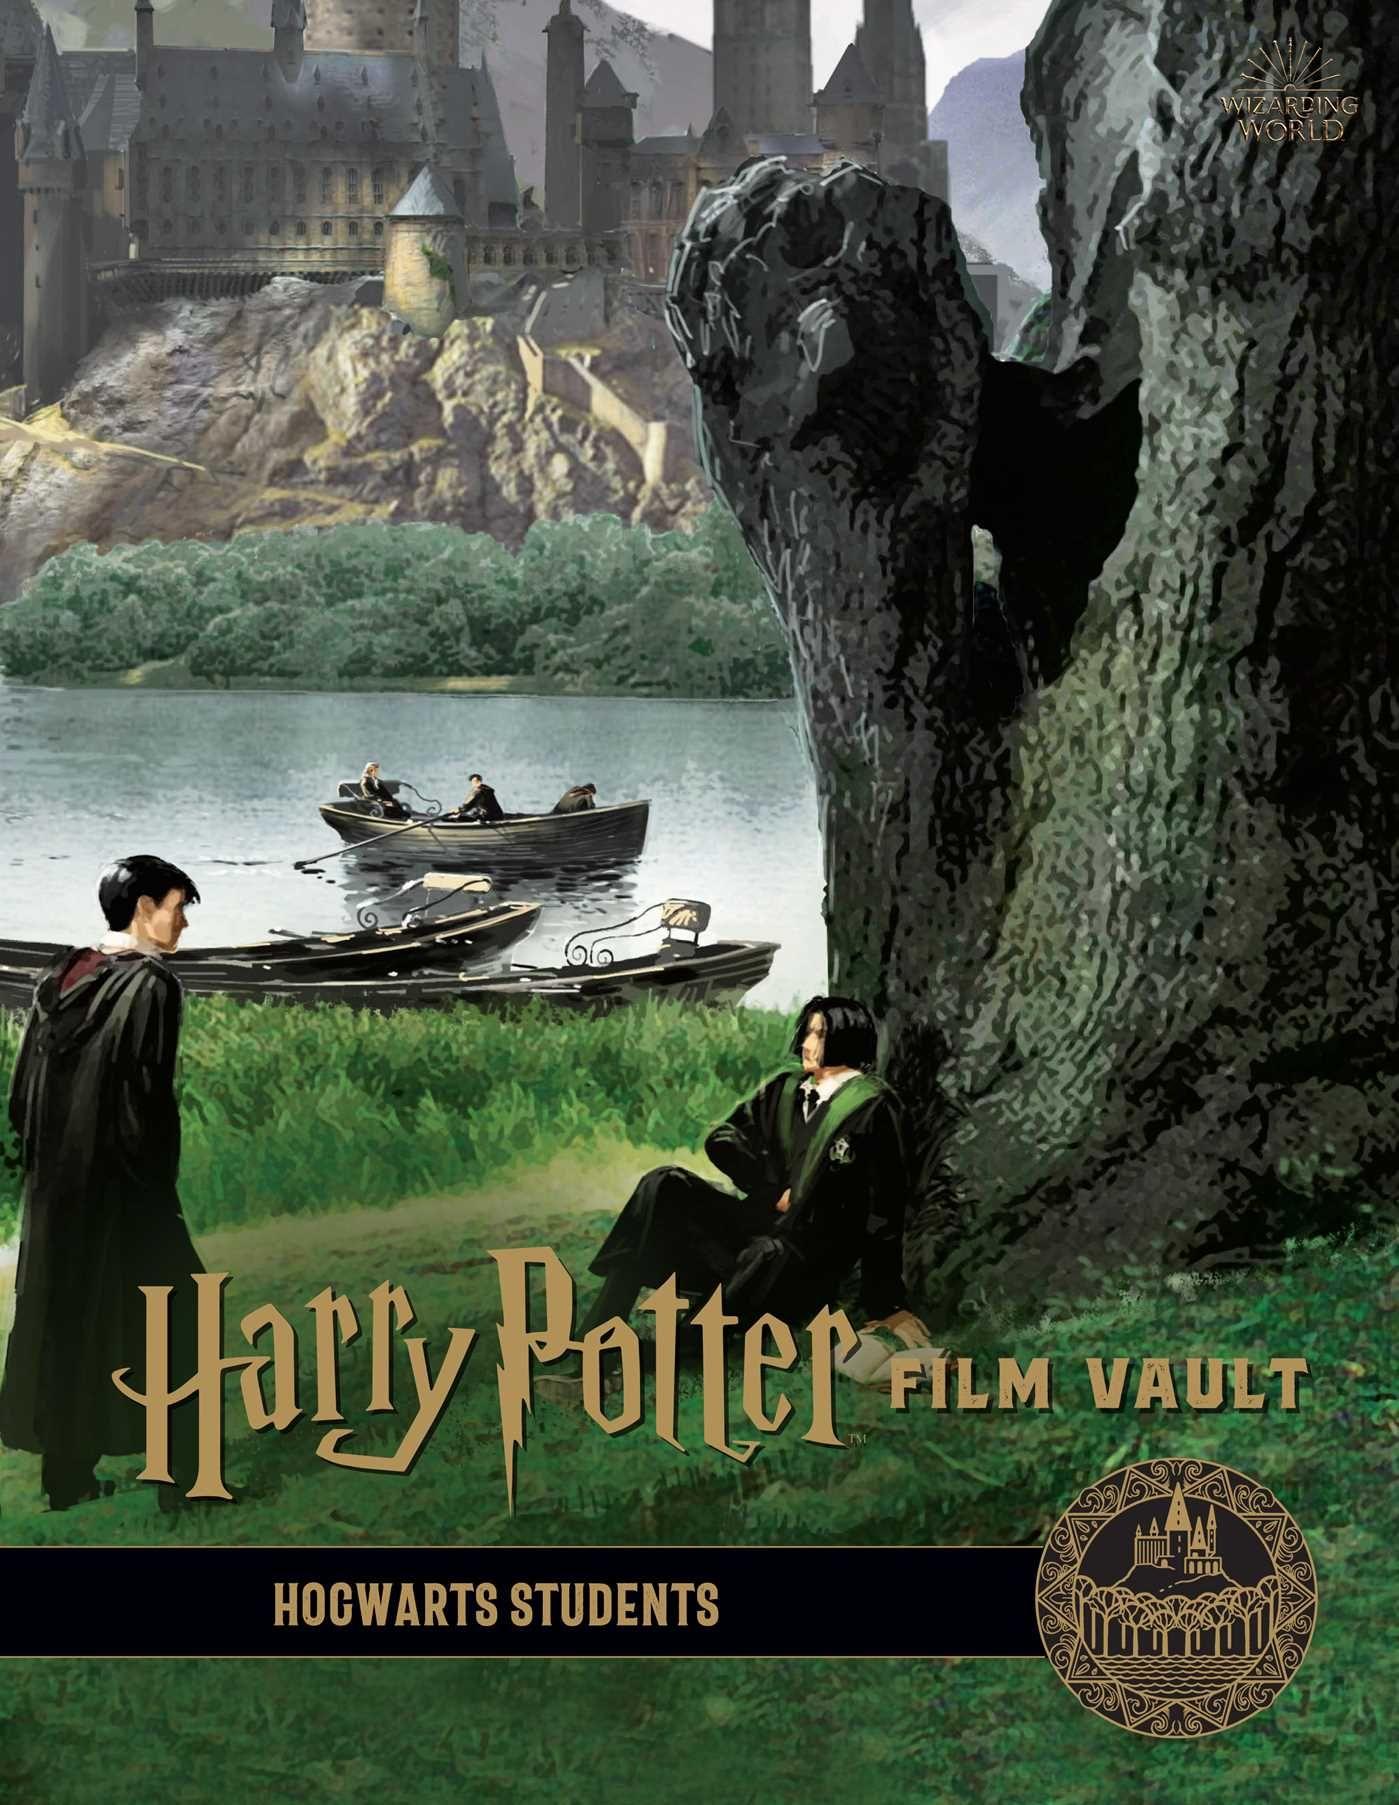 Harry Potter Film Vault Volume 4 Hogwarts Students Hardcover Walmart Com Harry Potter Film Hogwarts Books A Million